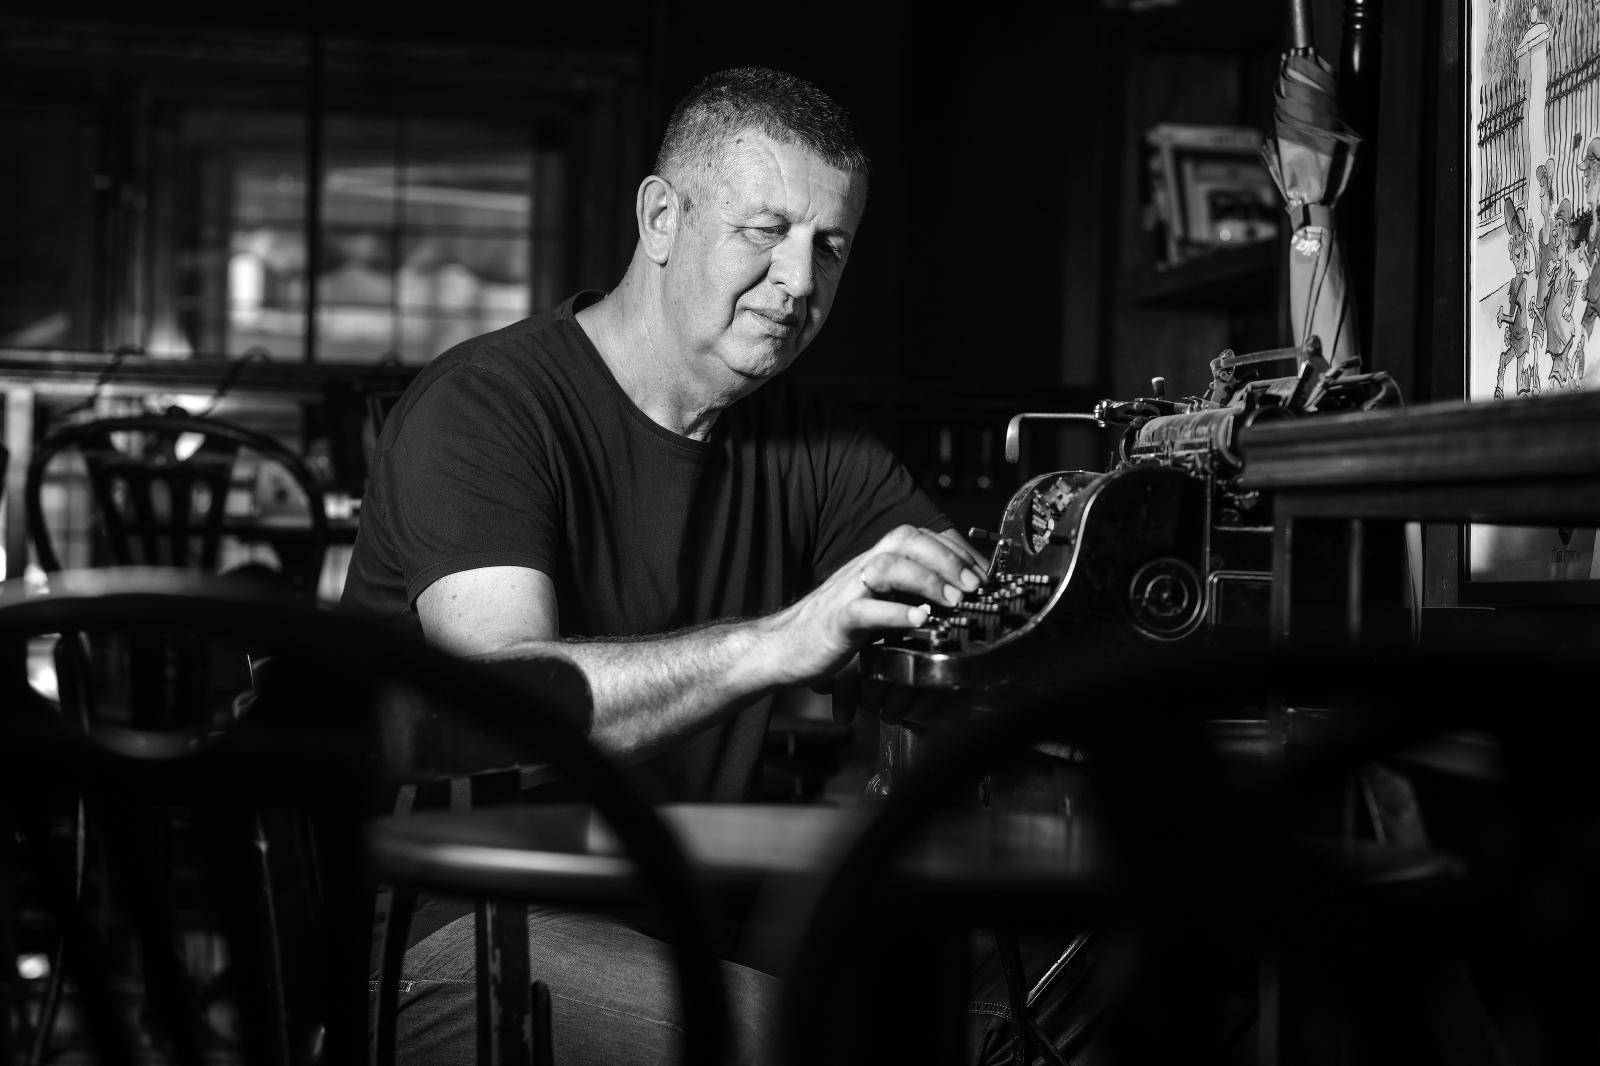 Josip Mlakić: Moj roman 'Skica u ledu' treba biti i videoigra